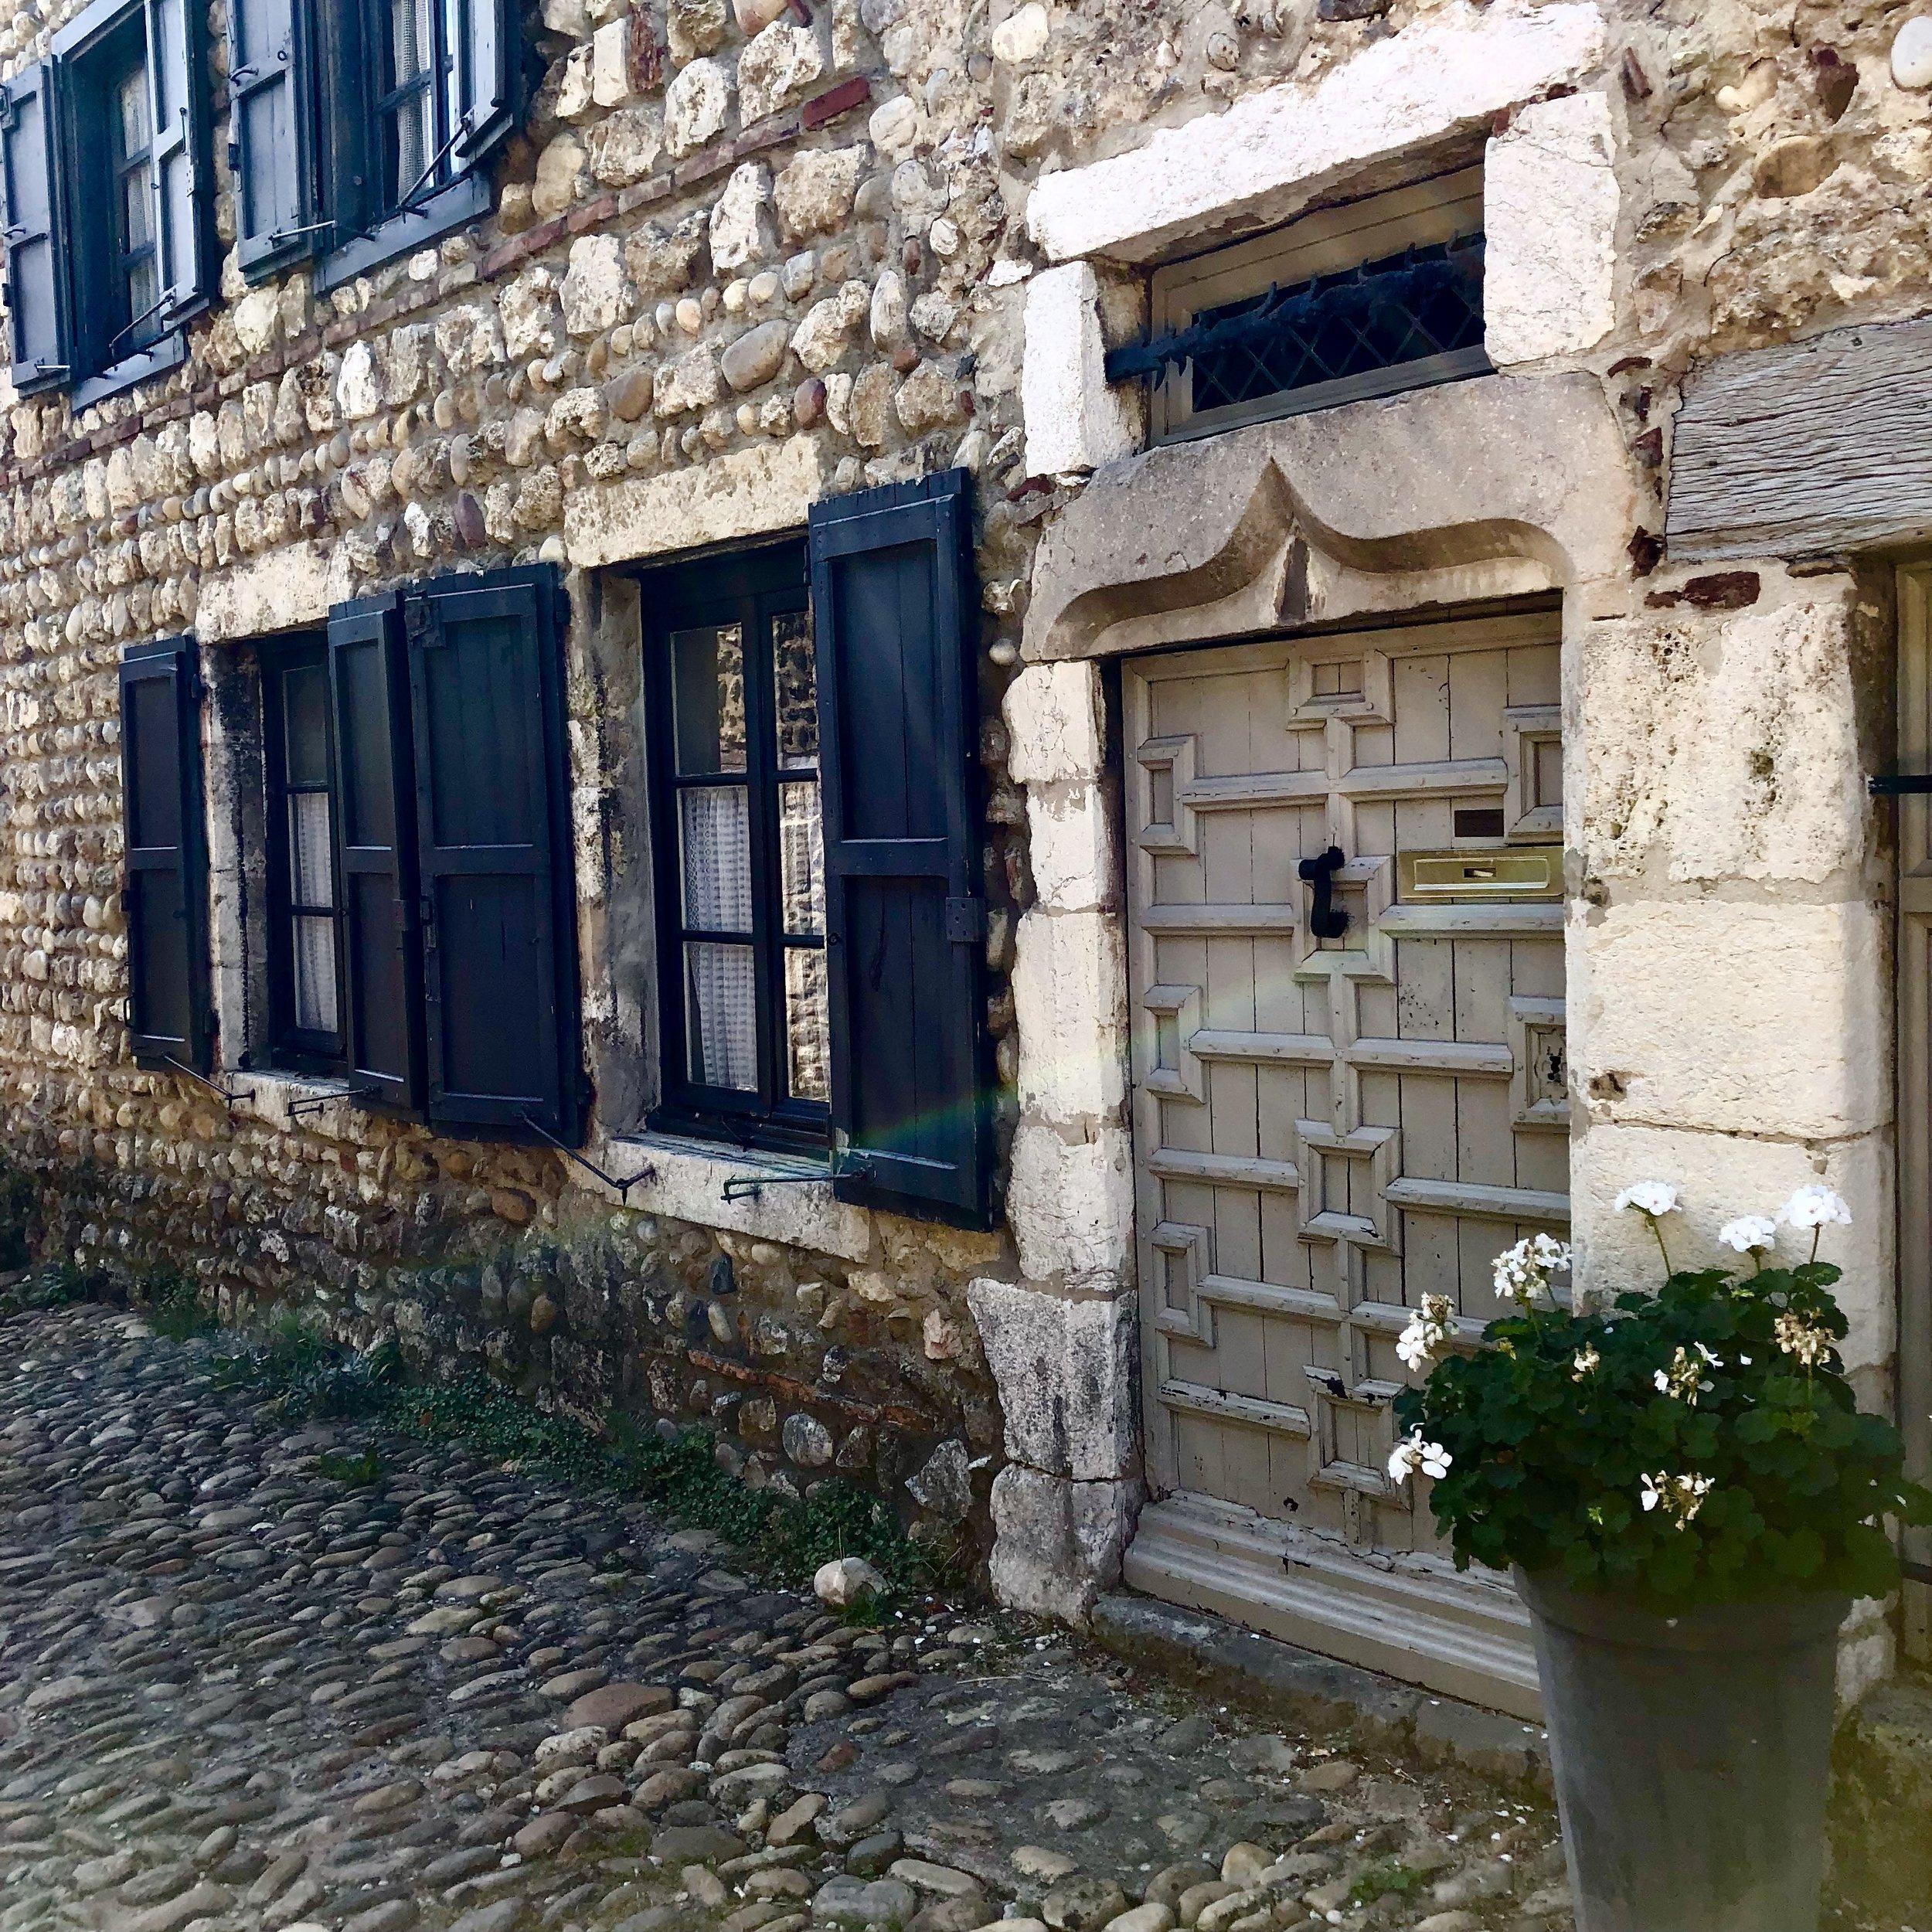 A home in Pérouges, France